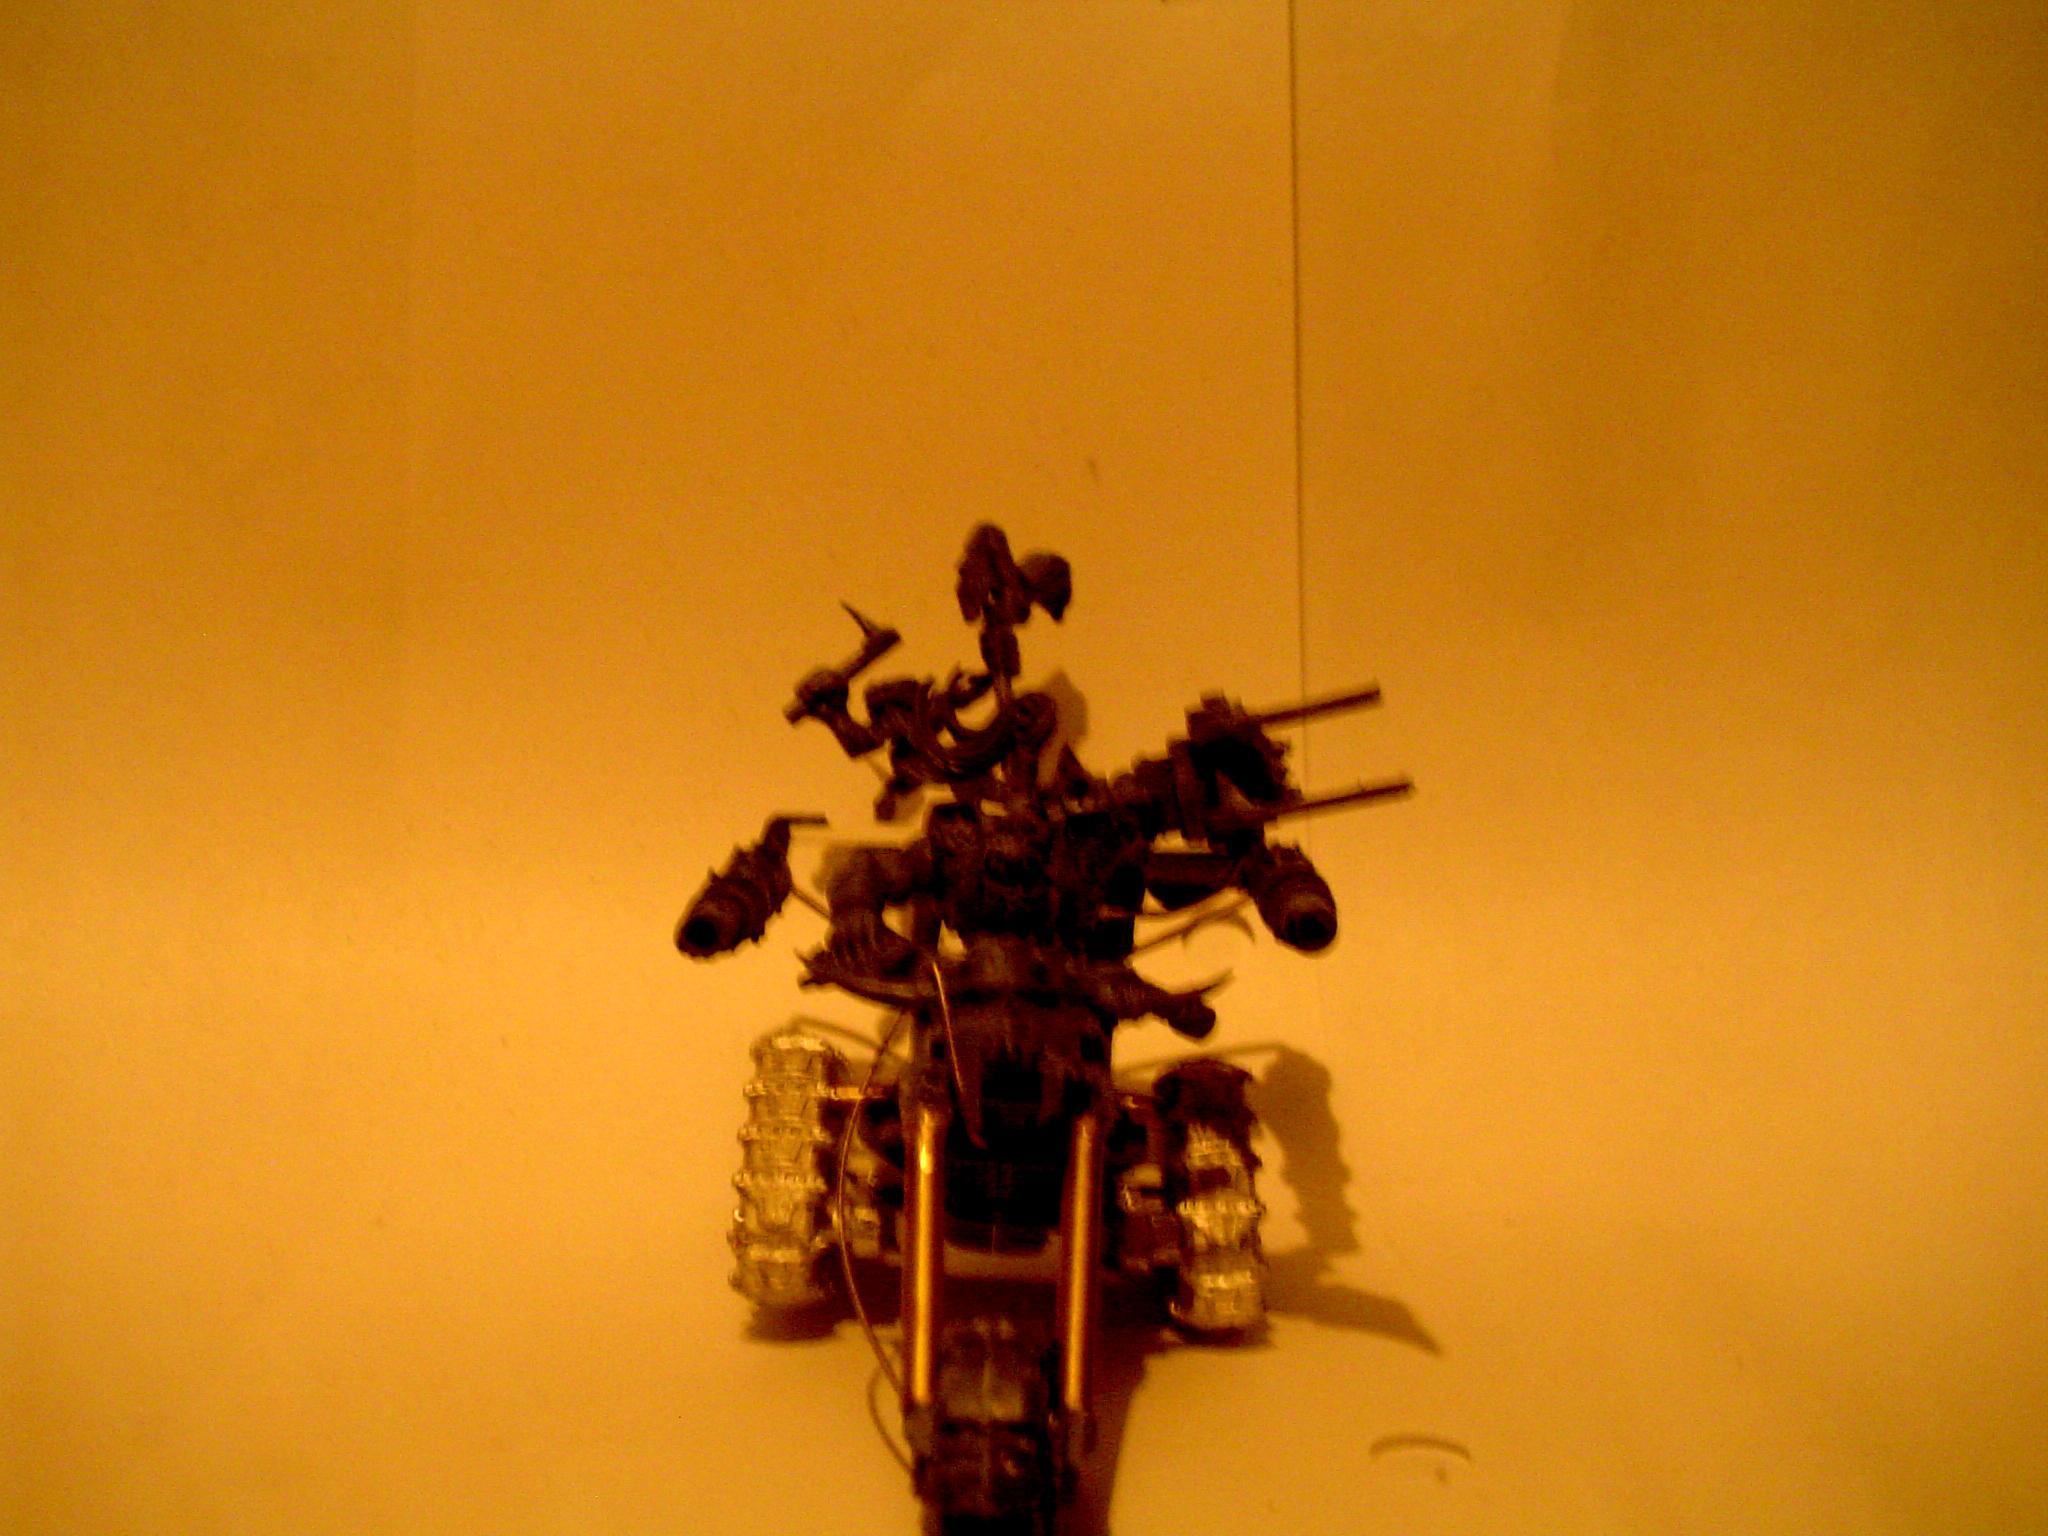 Bike, Blurred Photo, Dark Image, Orks